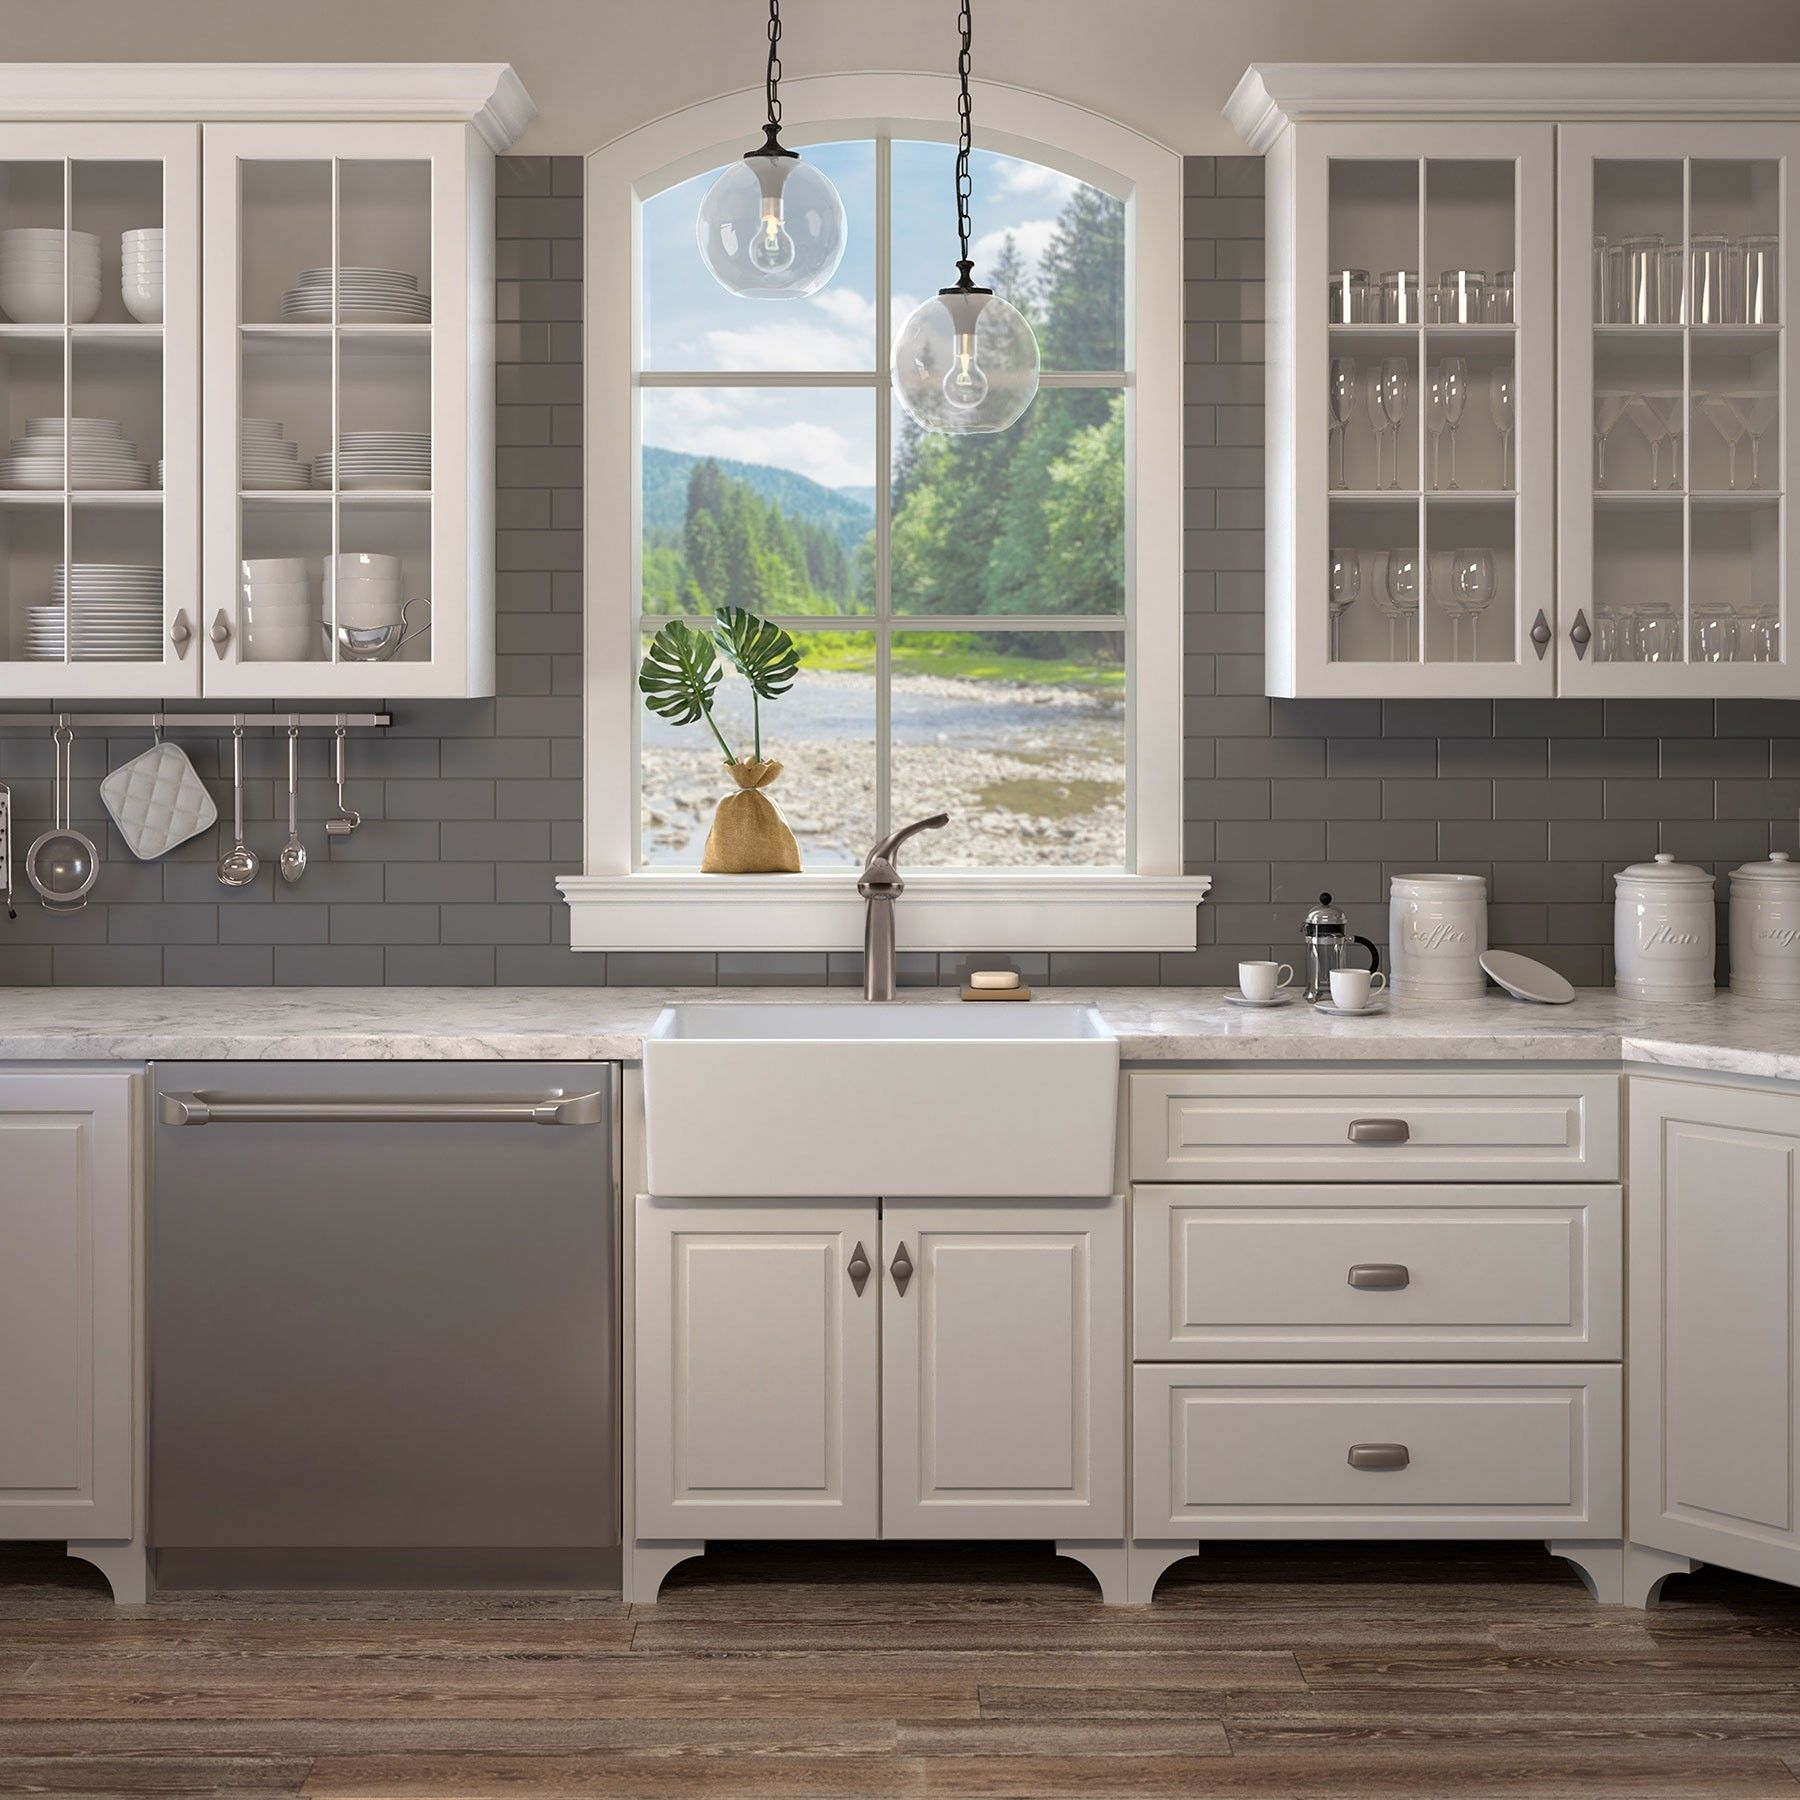 Best Surrey 30 Fireclay Farmhouse Kitchen Sink Farmhouse 400 x 300